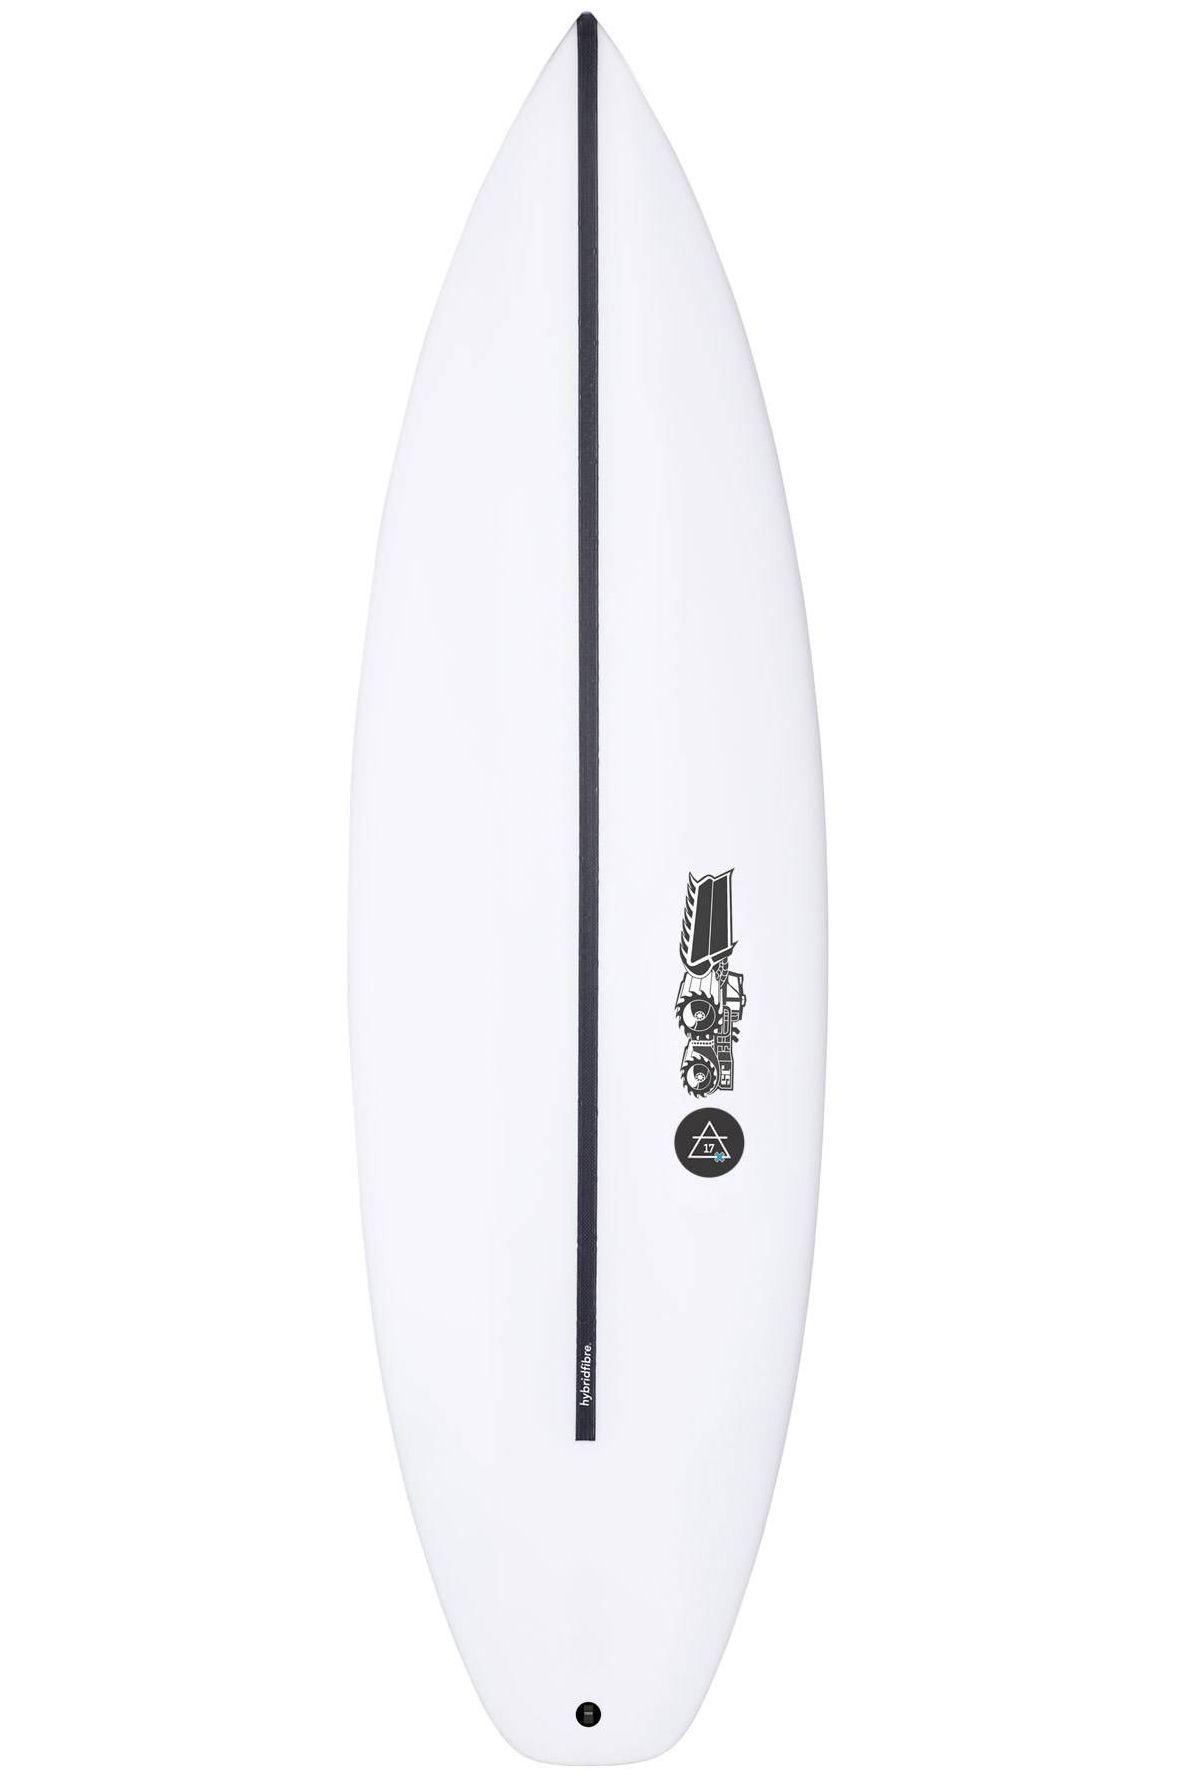 Prancha Surf JS 6'1 JULIAN AIR- 17X HYFI Squash Tail - White FCS II 6ft1